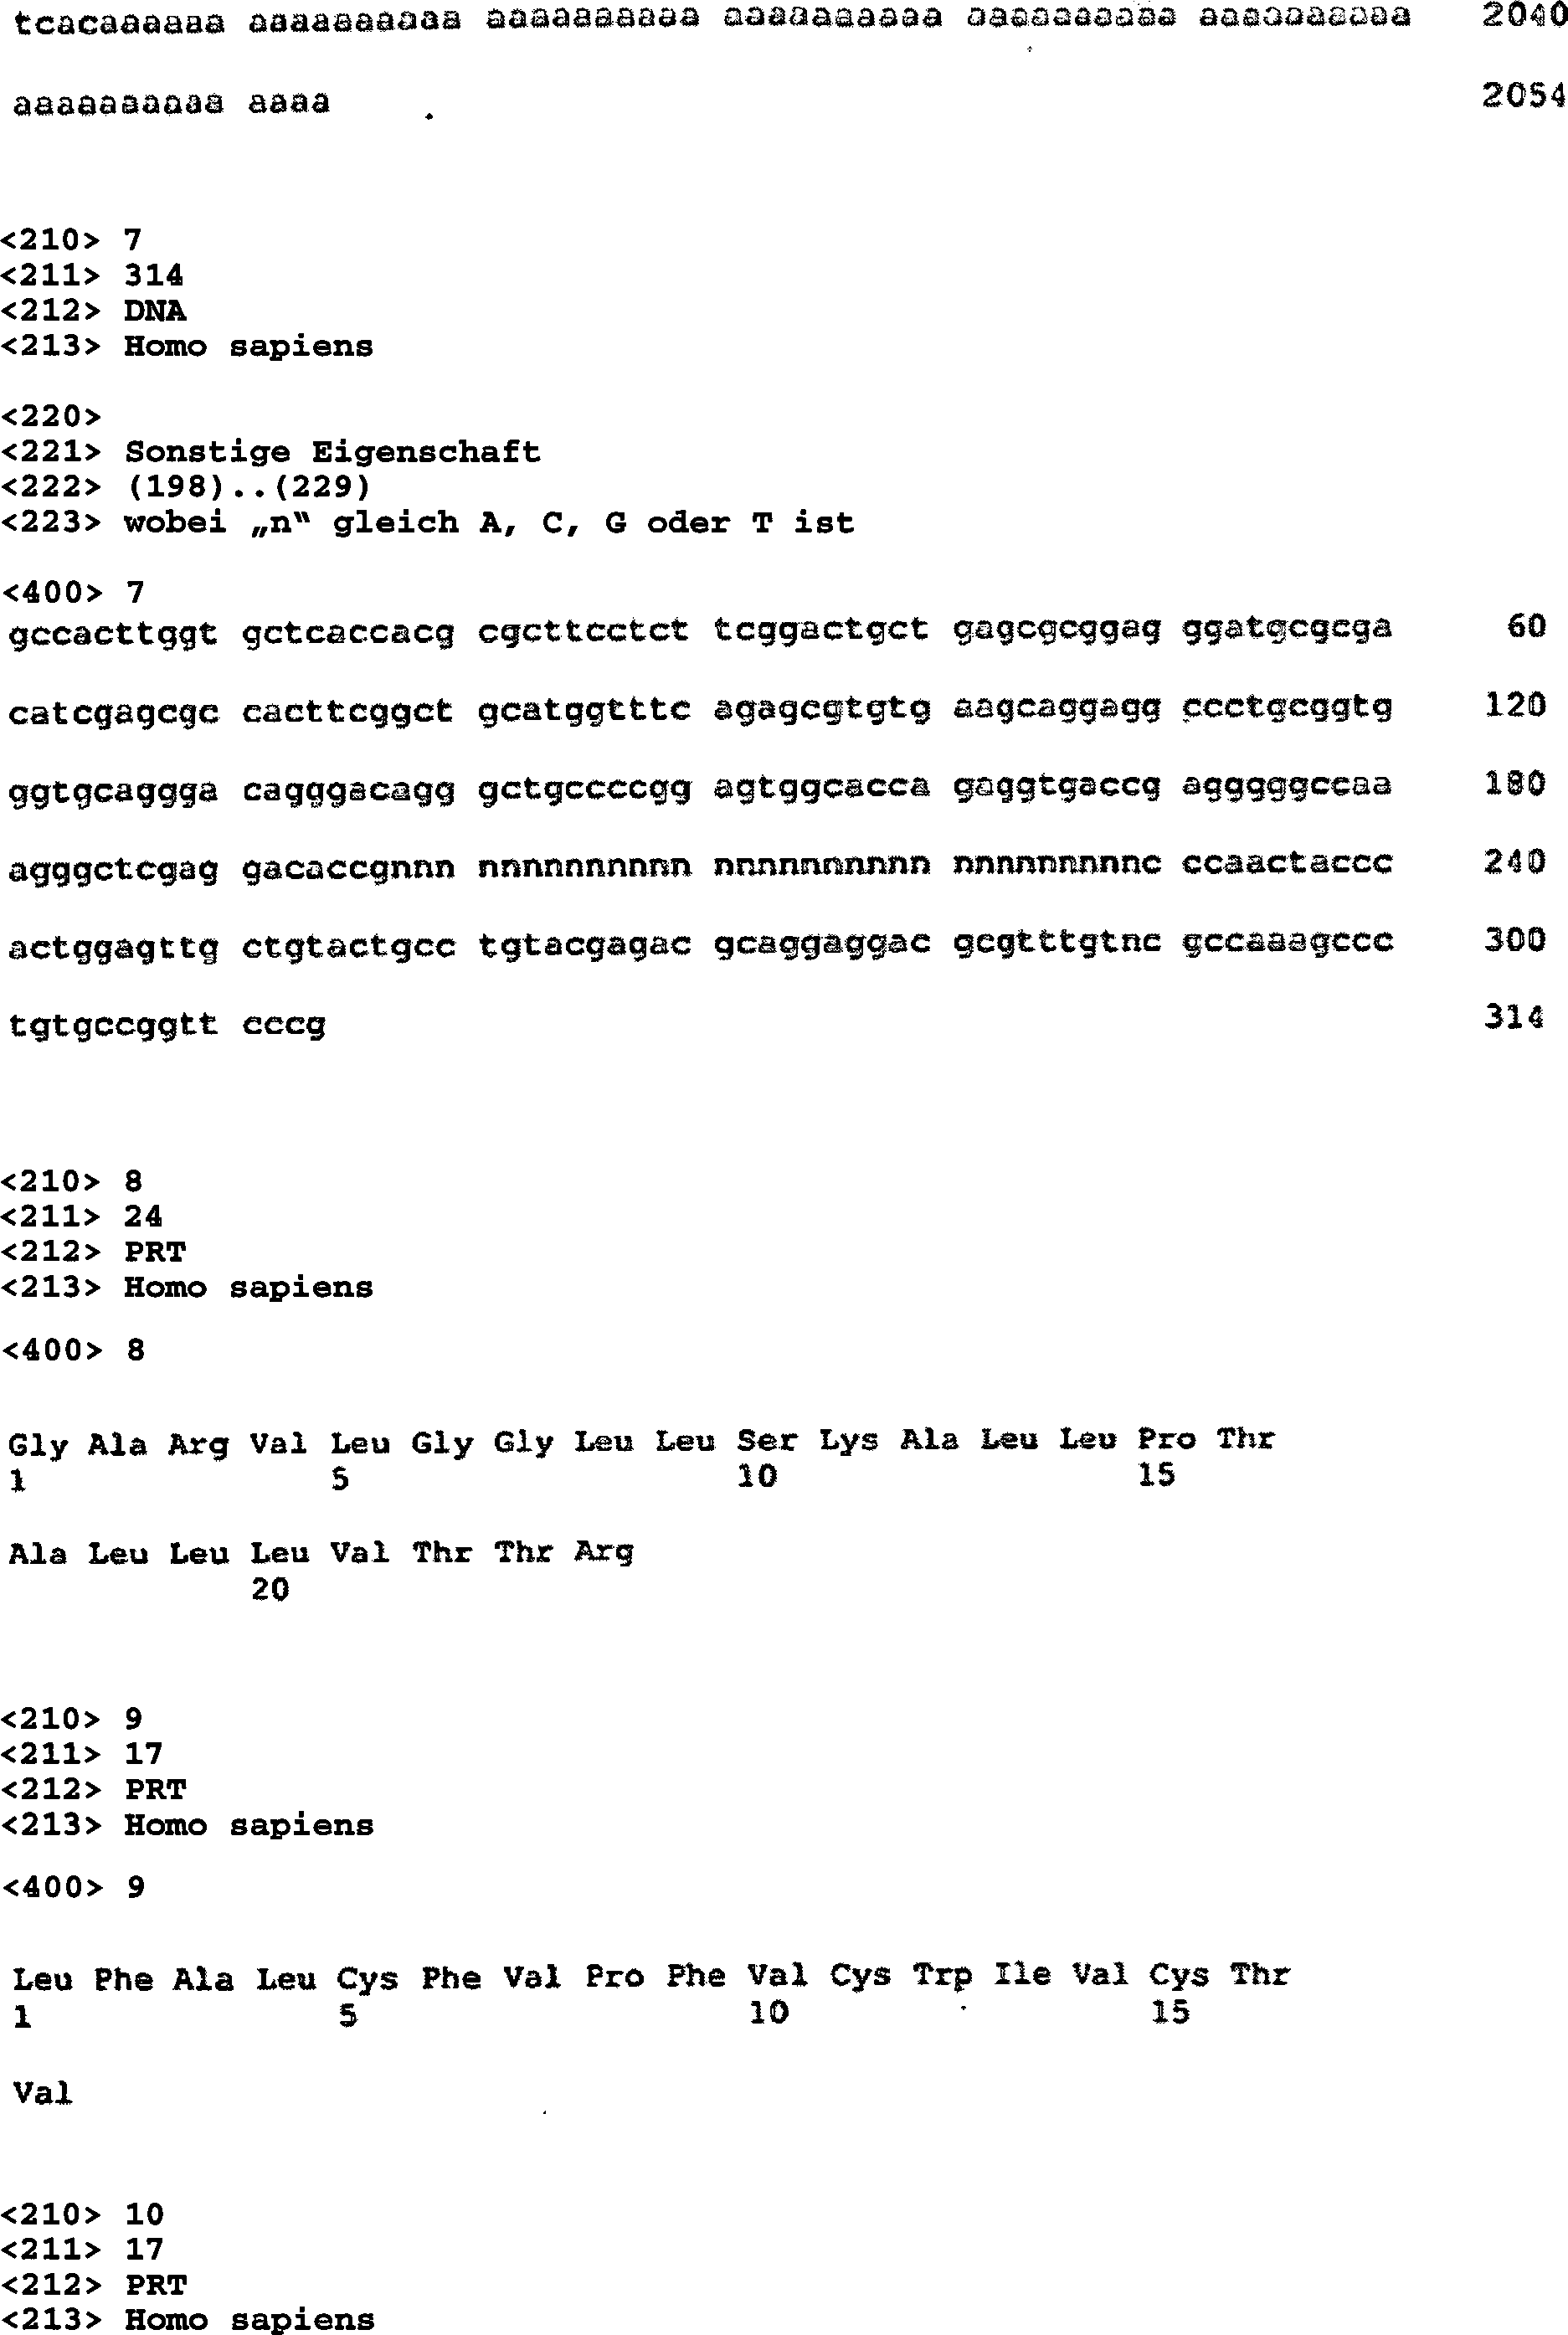 Crossdating methode champenoise